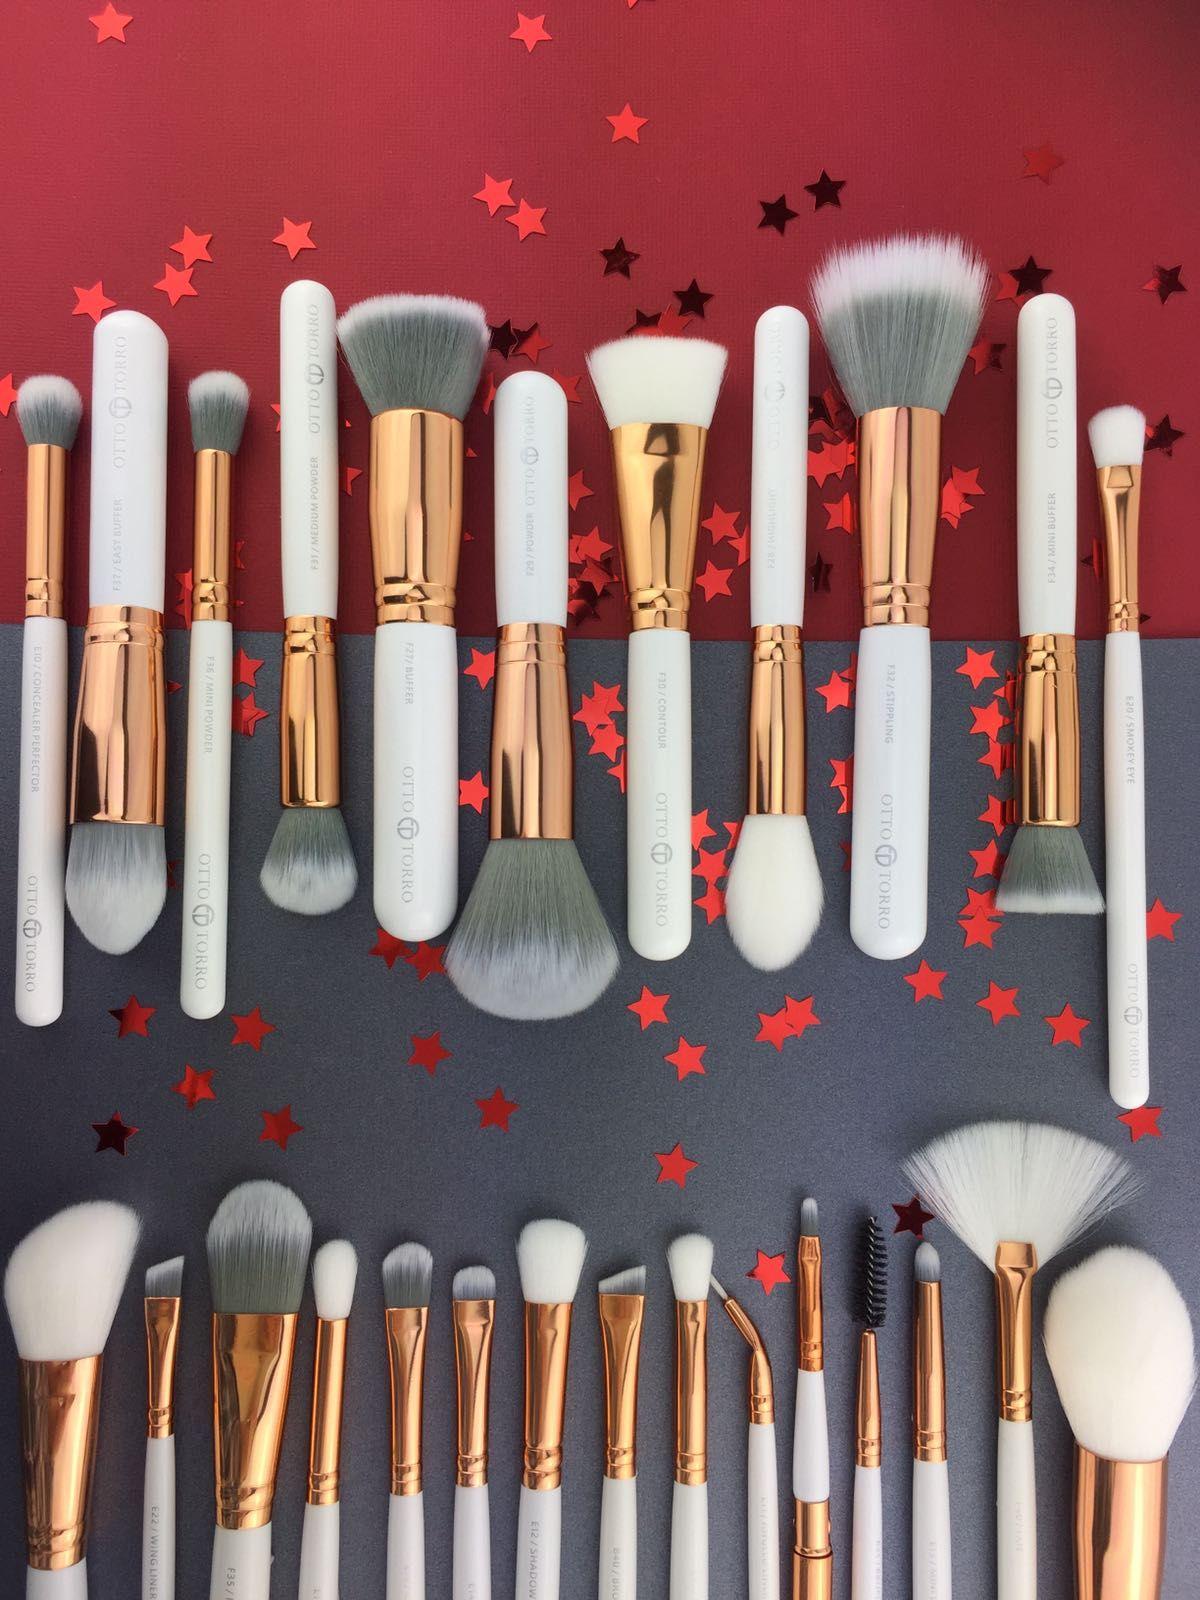 Pandora Cosmetic Bag Rose gold brushes, Makeup brush set